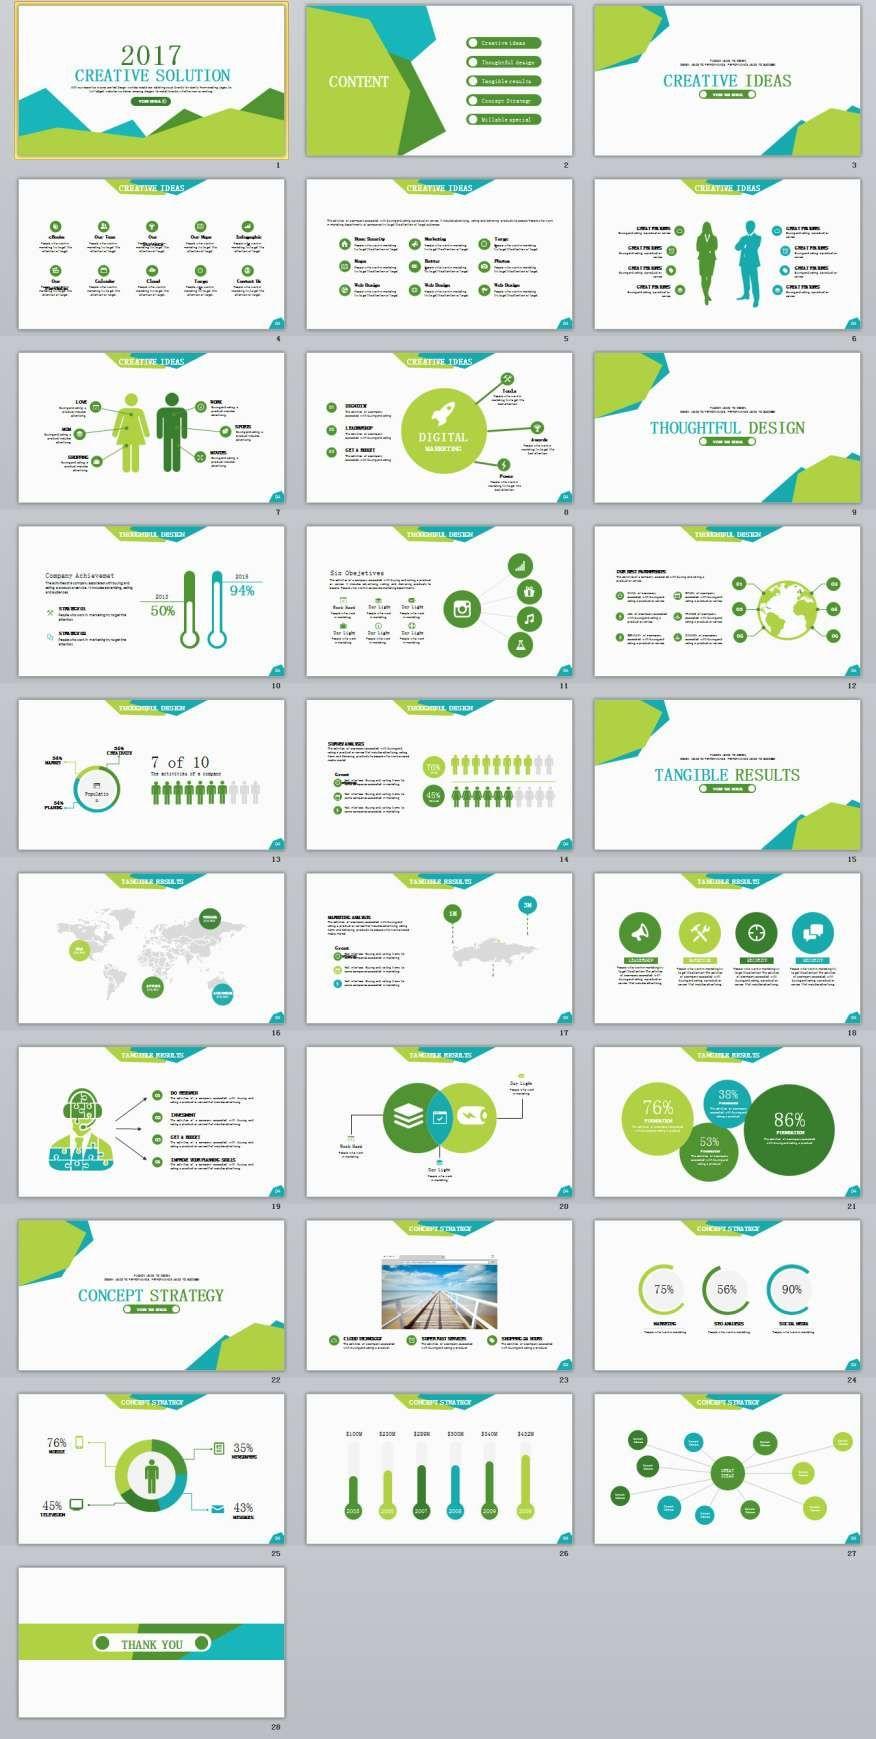 creative ideas powerpoint template | power point | pinterest, Modern powerpoint